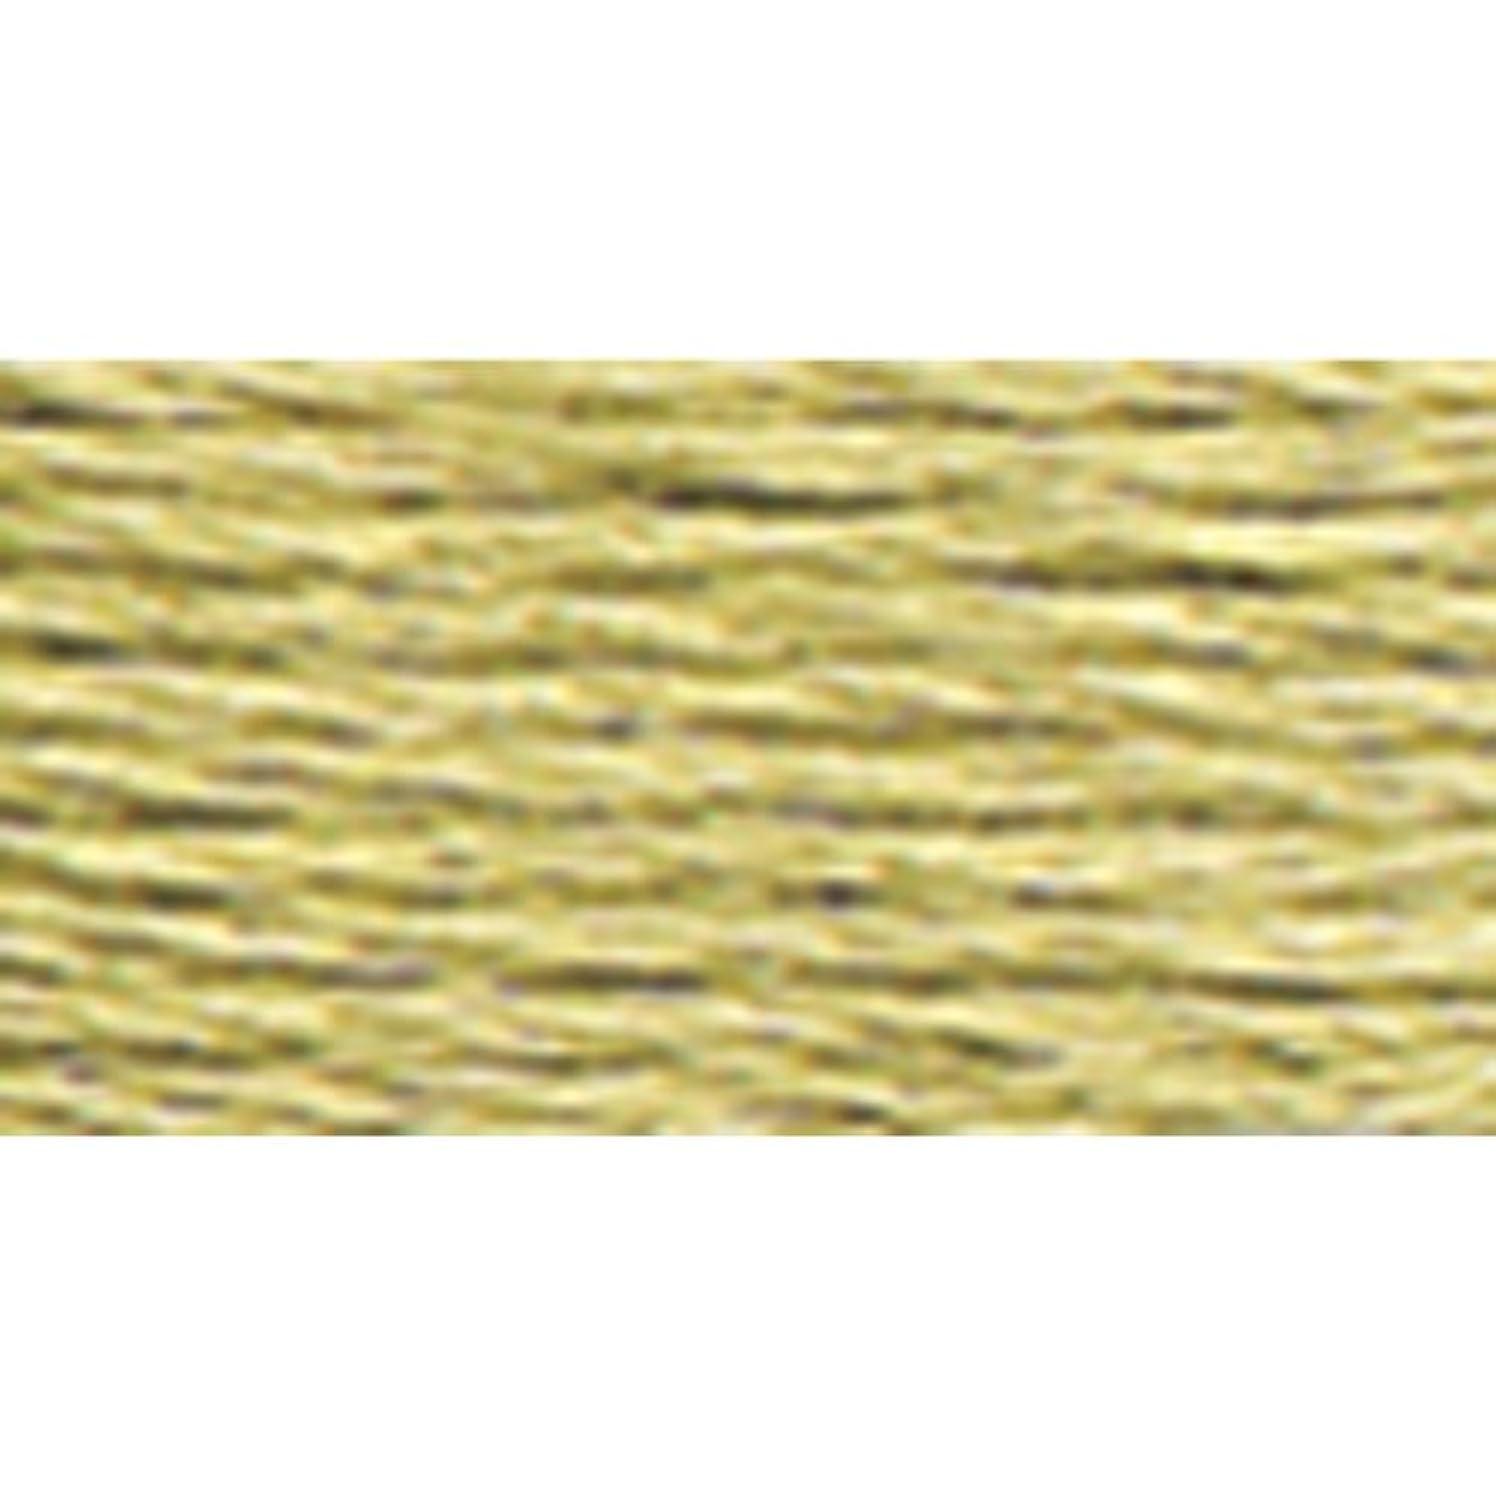 DMC 117-372 Mouline Stranded Cotton Six Strand Embroidery Floss Thread, Light Mustard, 8.7-Yard